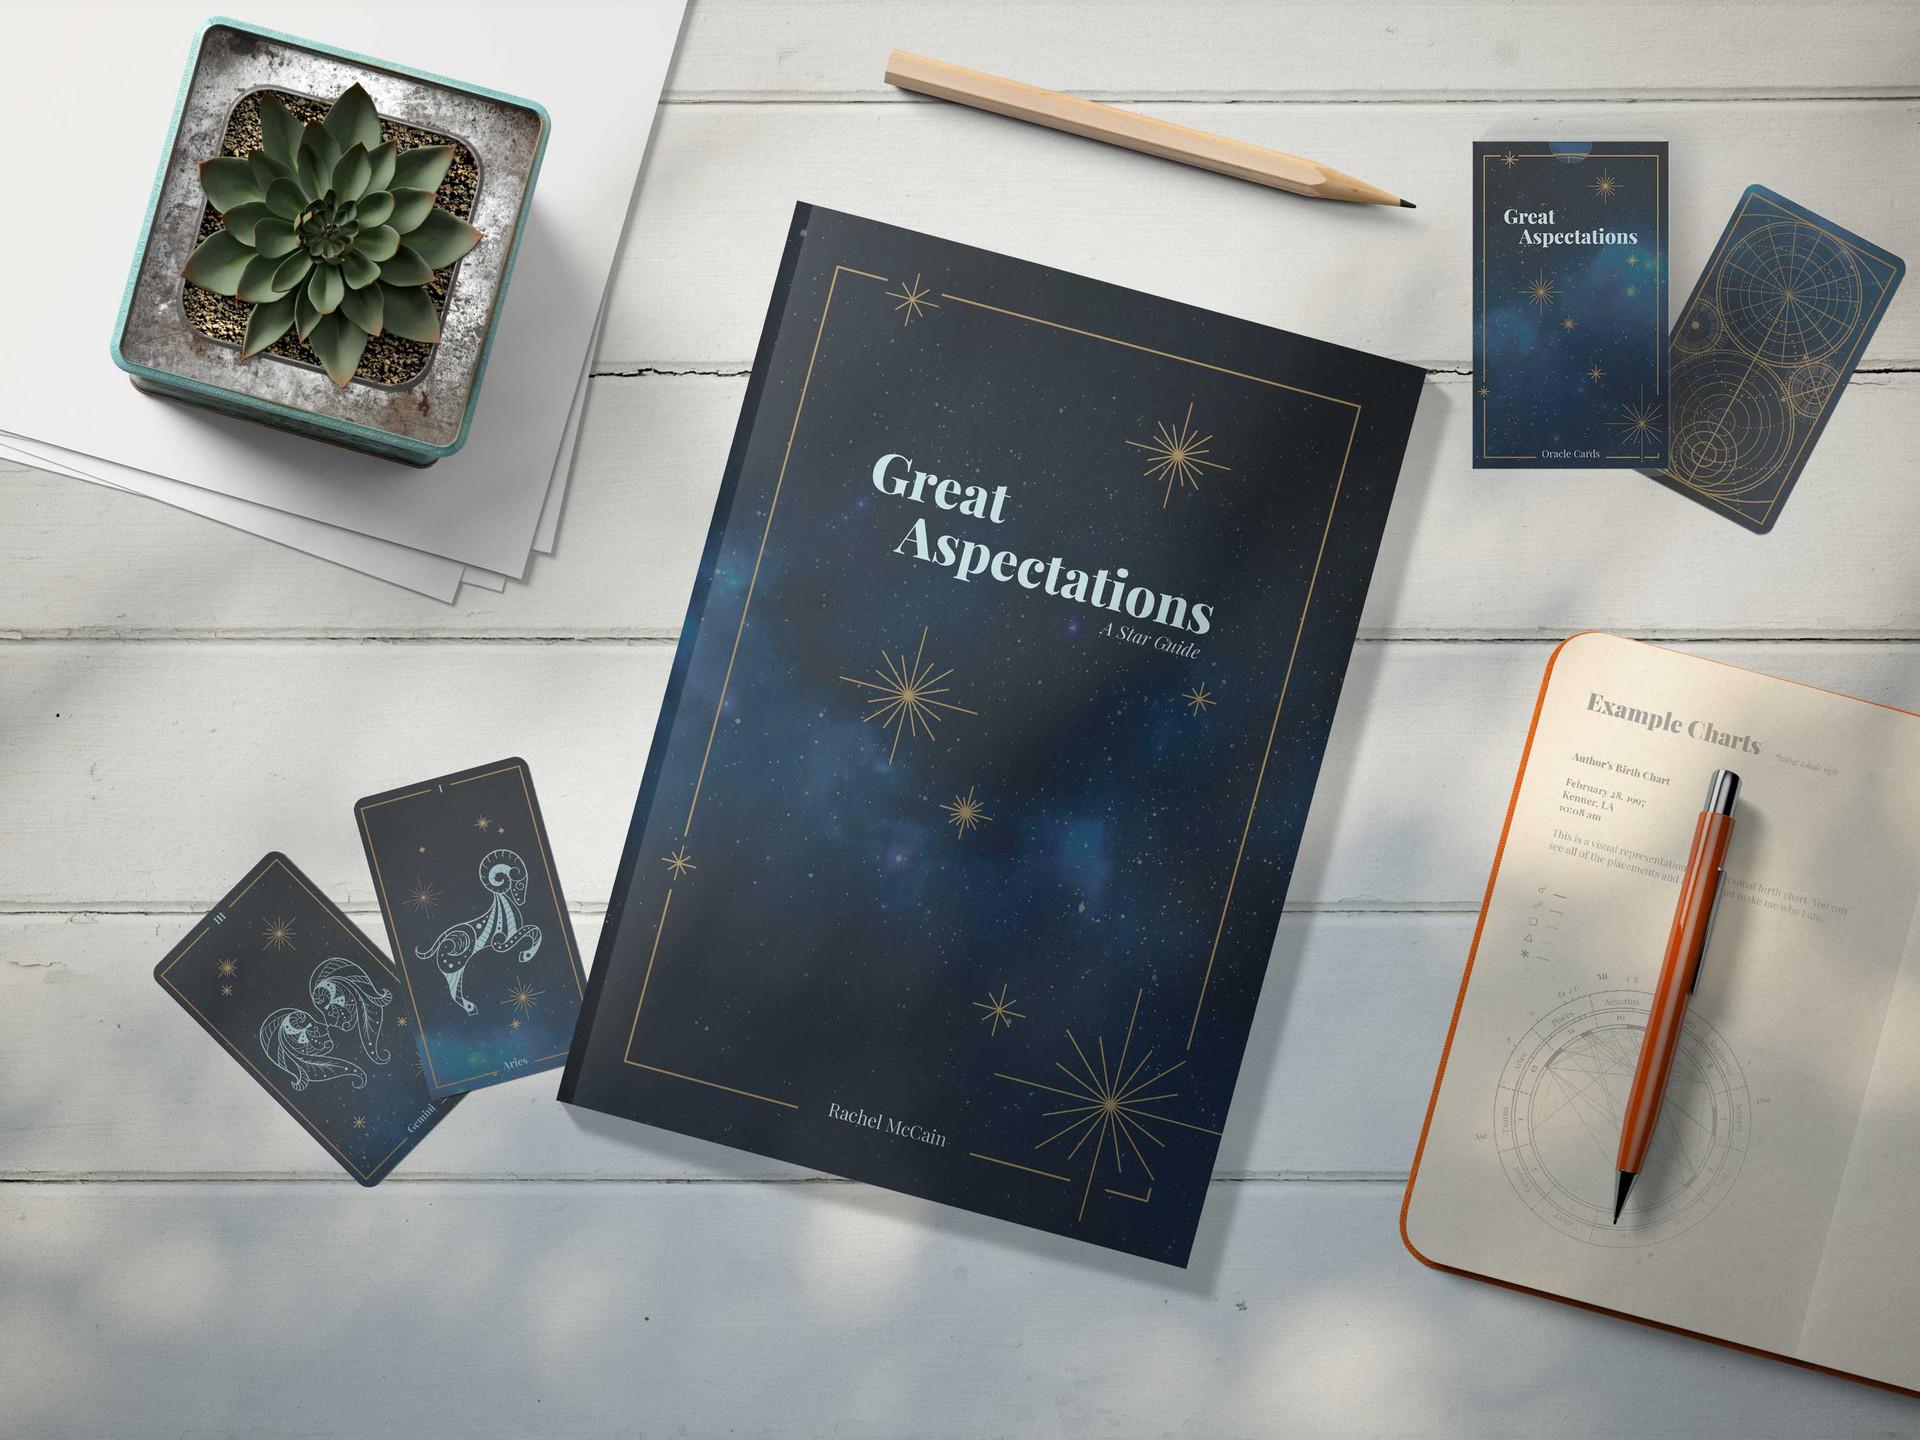 Great Aspectation - Senior Thesis